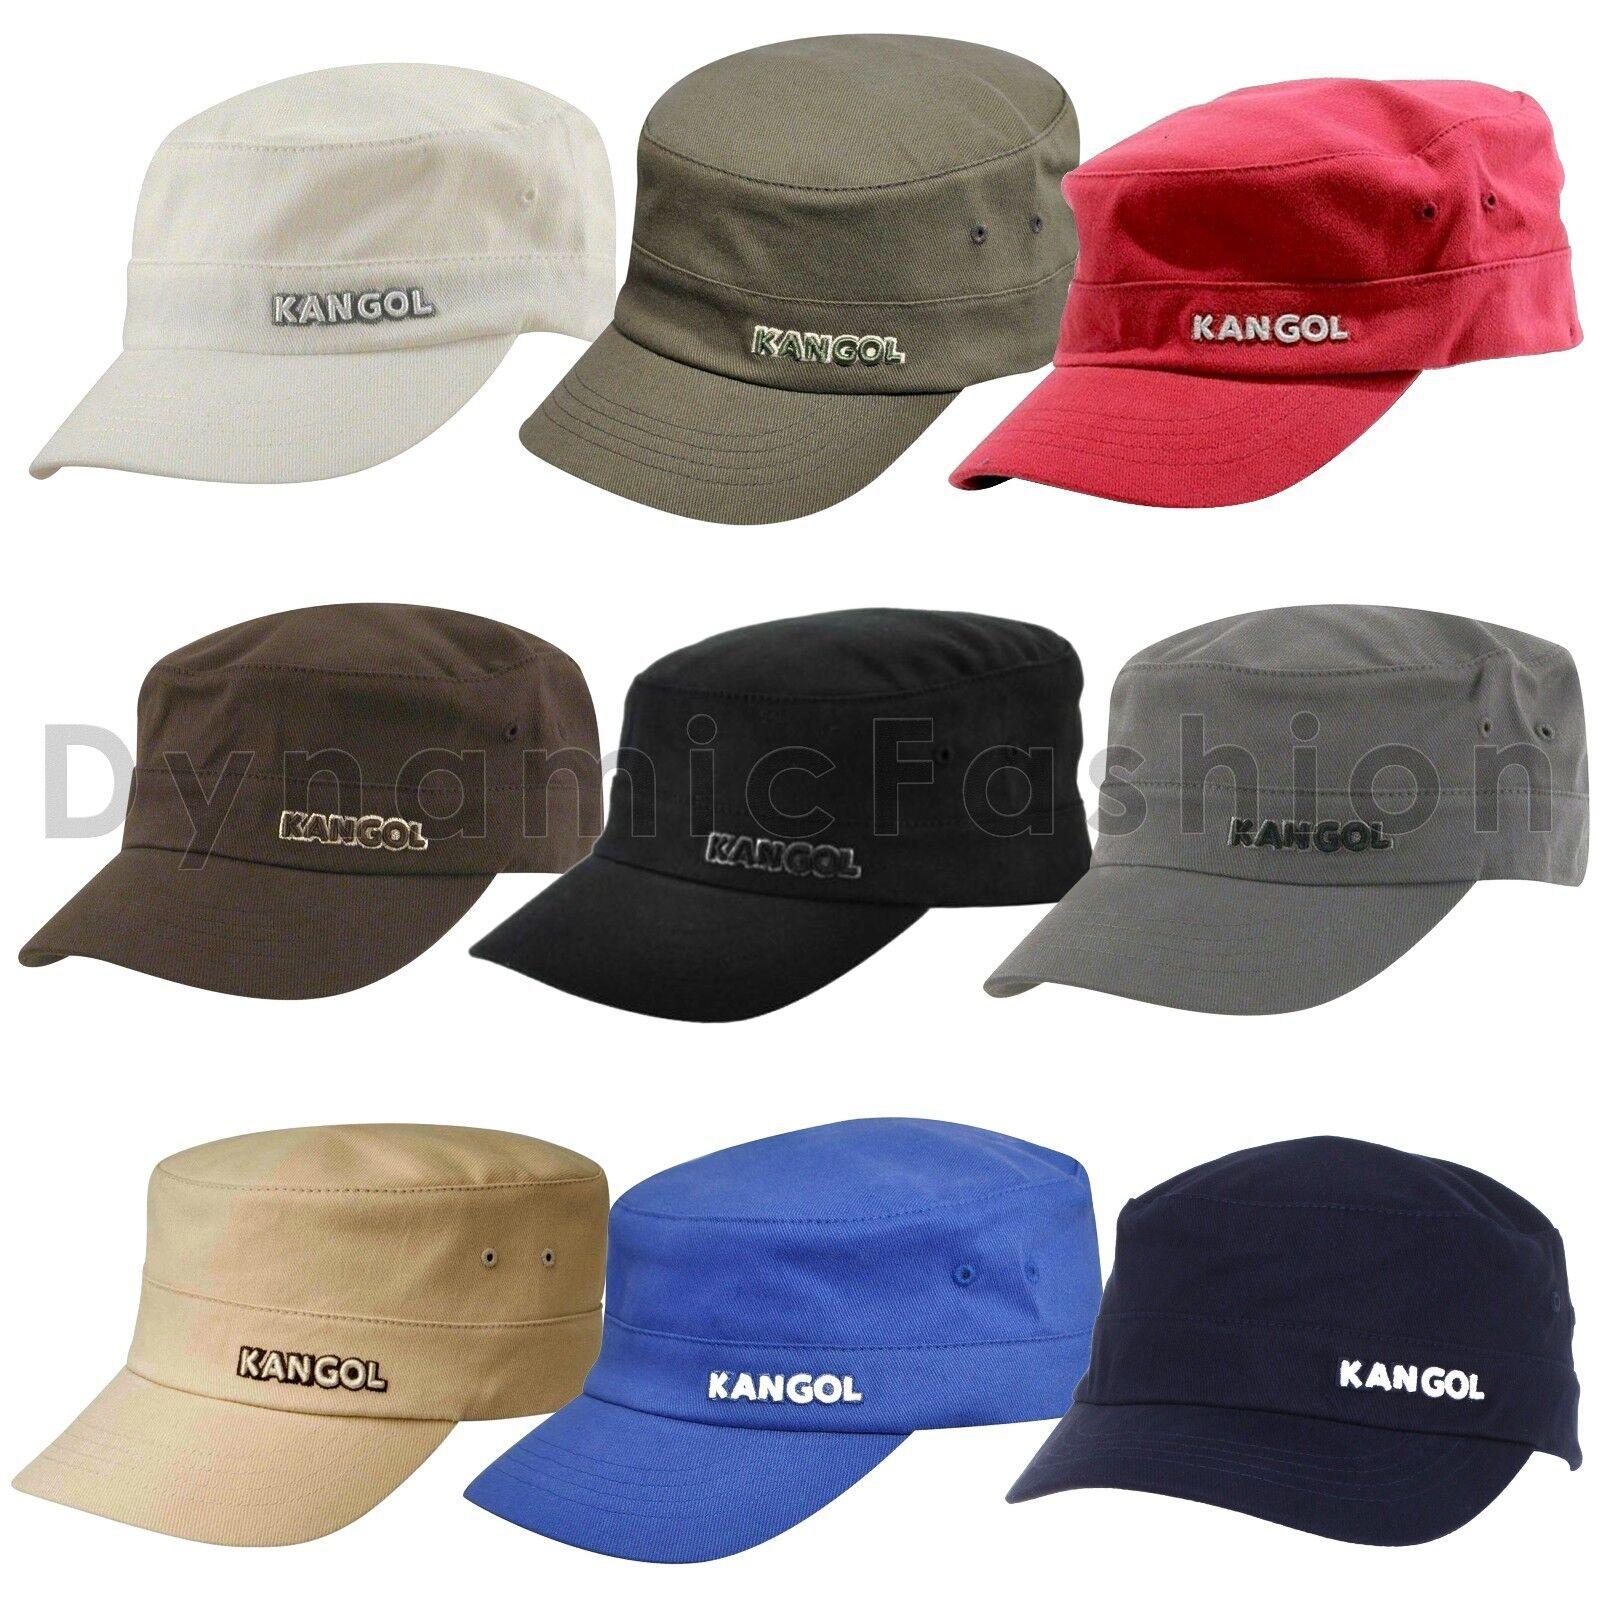 7c466feb91392e Kangol Cotton Twill Army Cap Black 9720BC L/xl for sale online | eBay